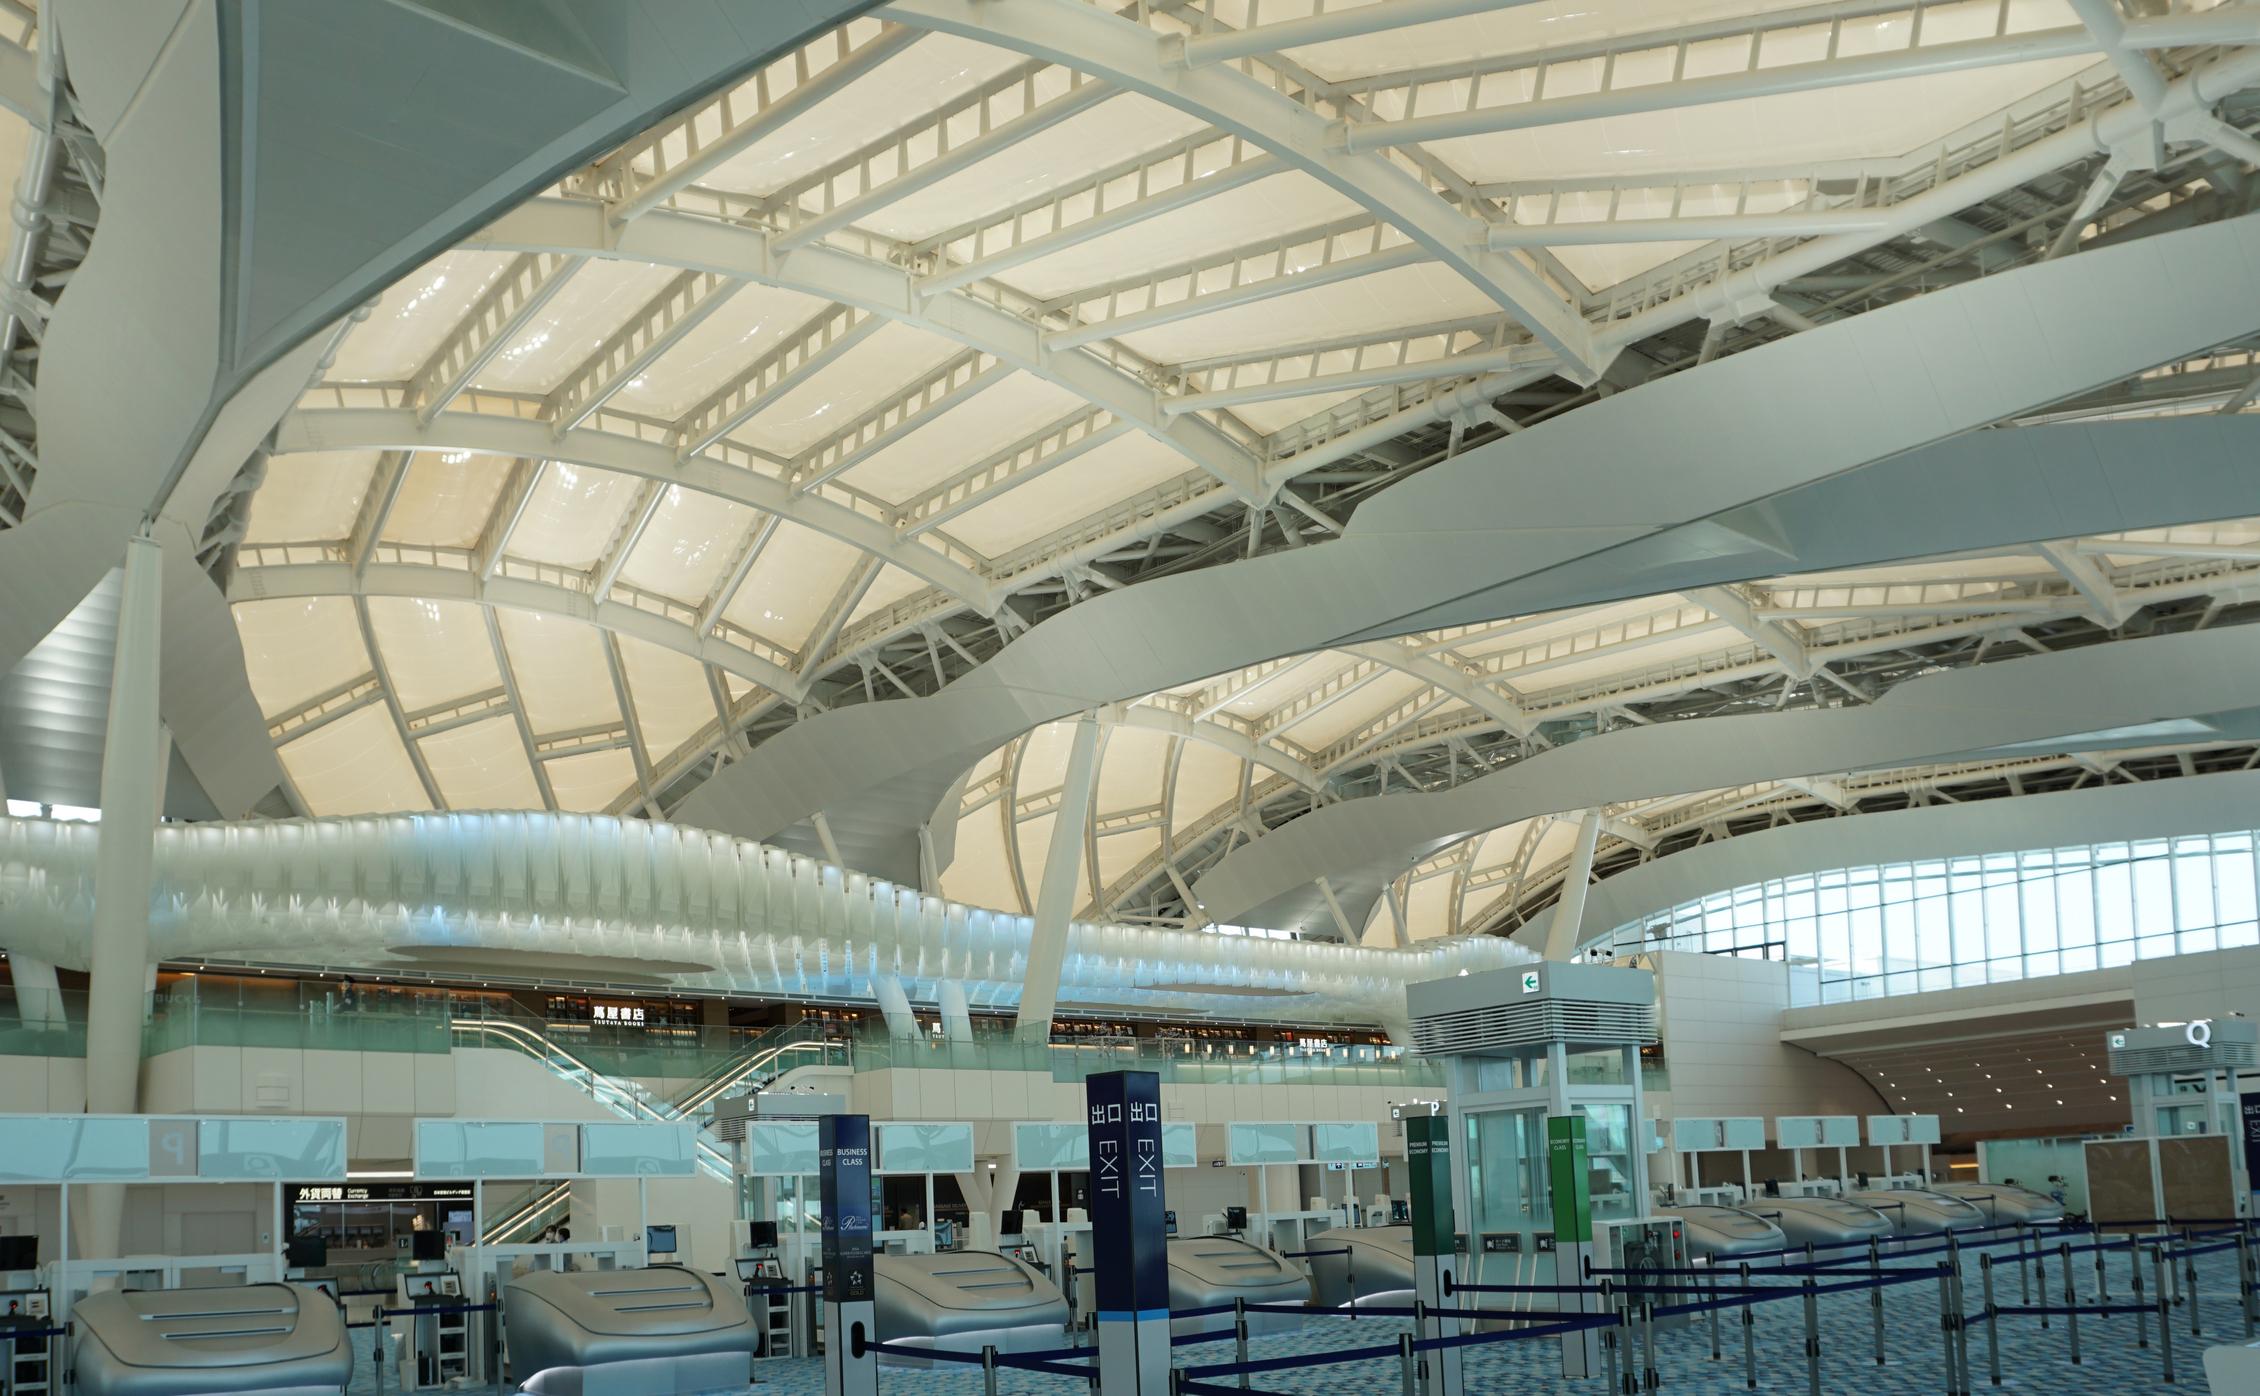 羽田空港ETFE